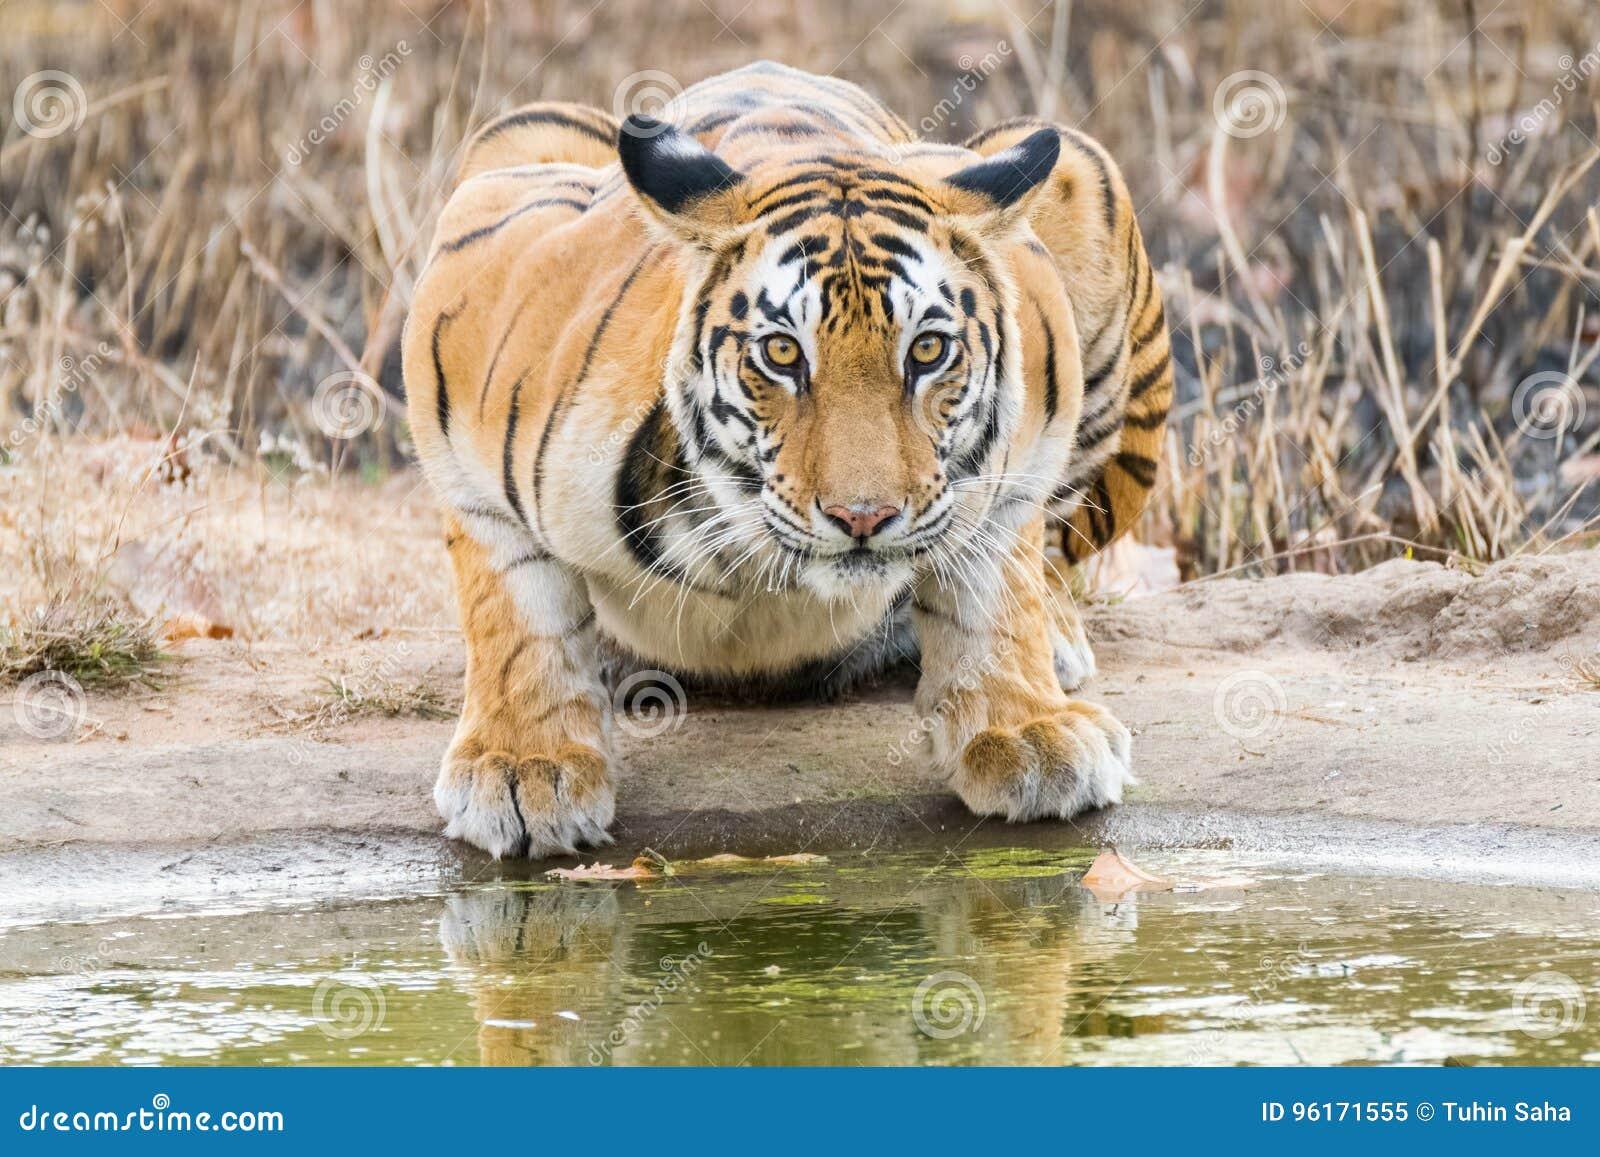 Regard fixe de tigresse